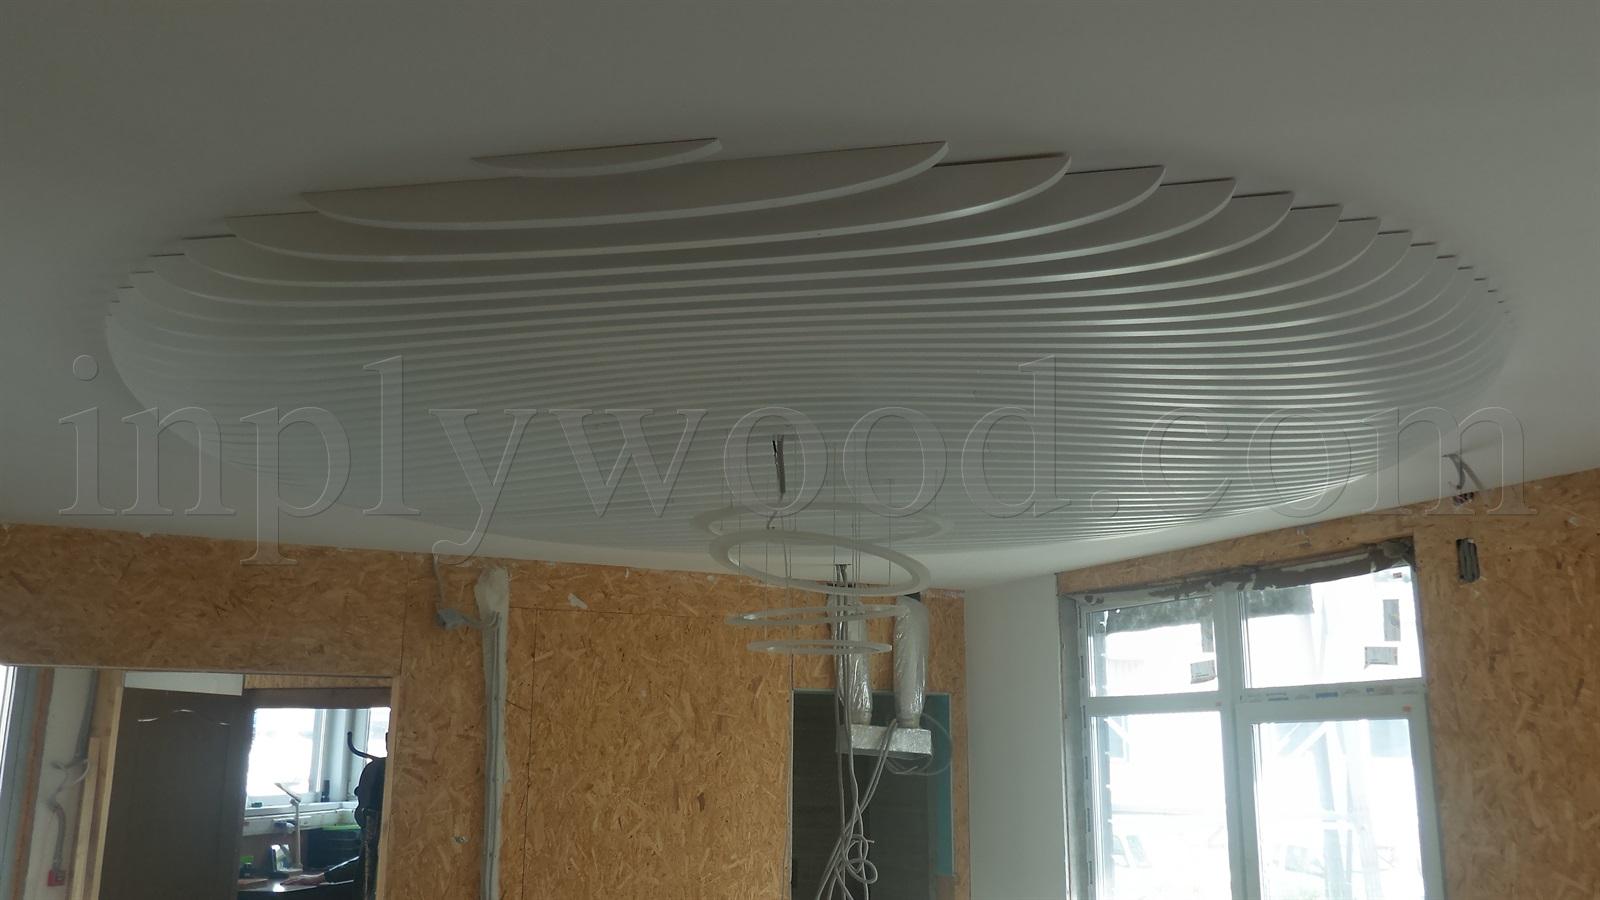 inplywood600